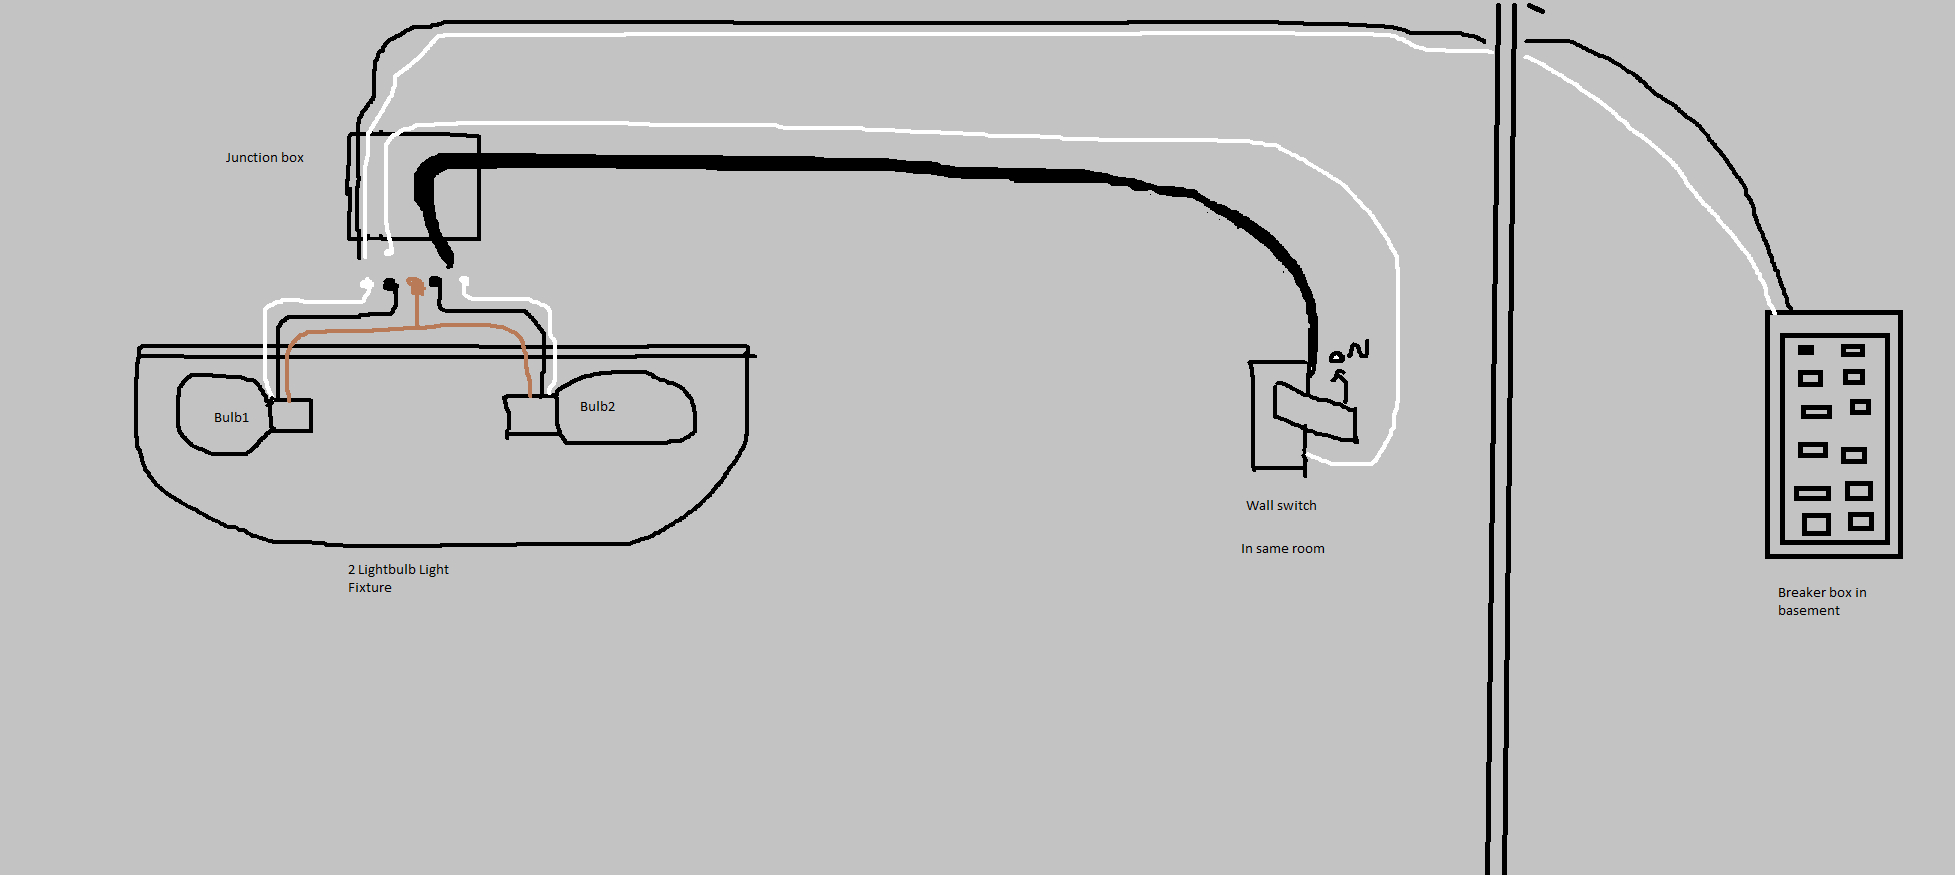 Wiring 2 Light Fixtures - Wiring Diagram Data Oreo - Ceiling Light Wiring Diagram